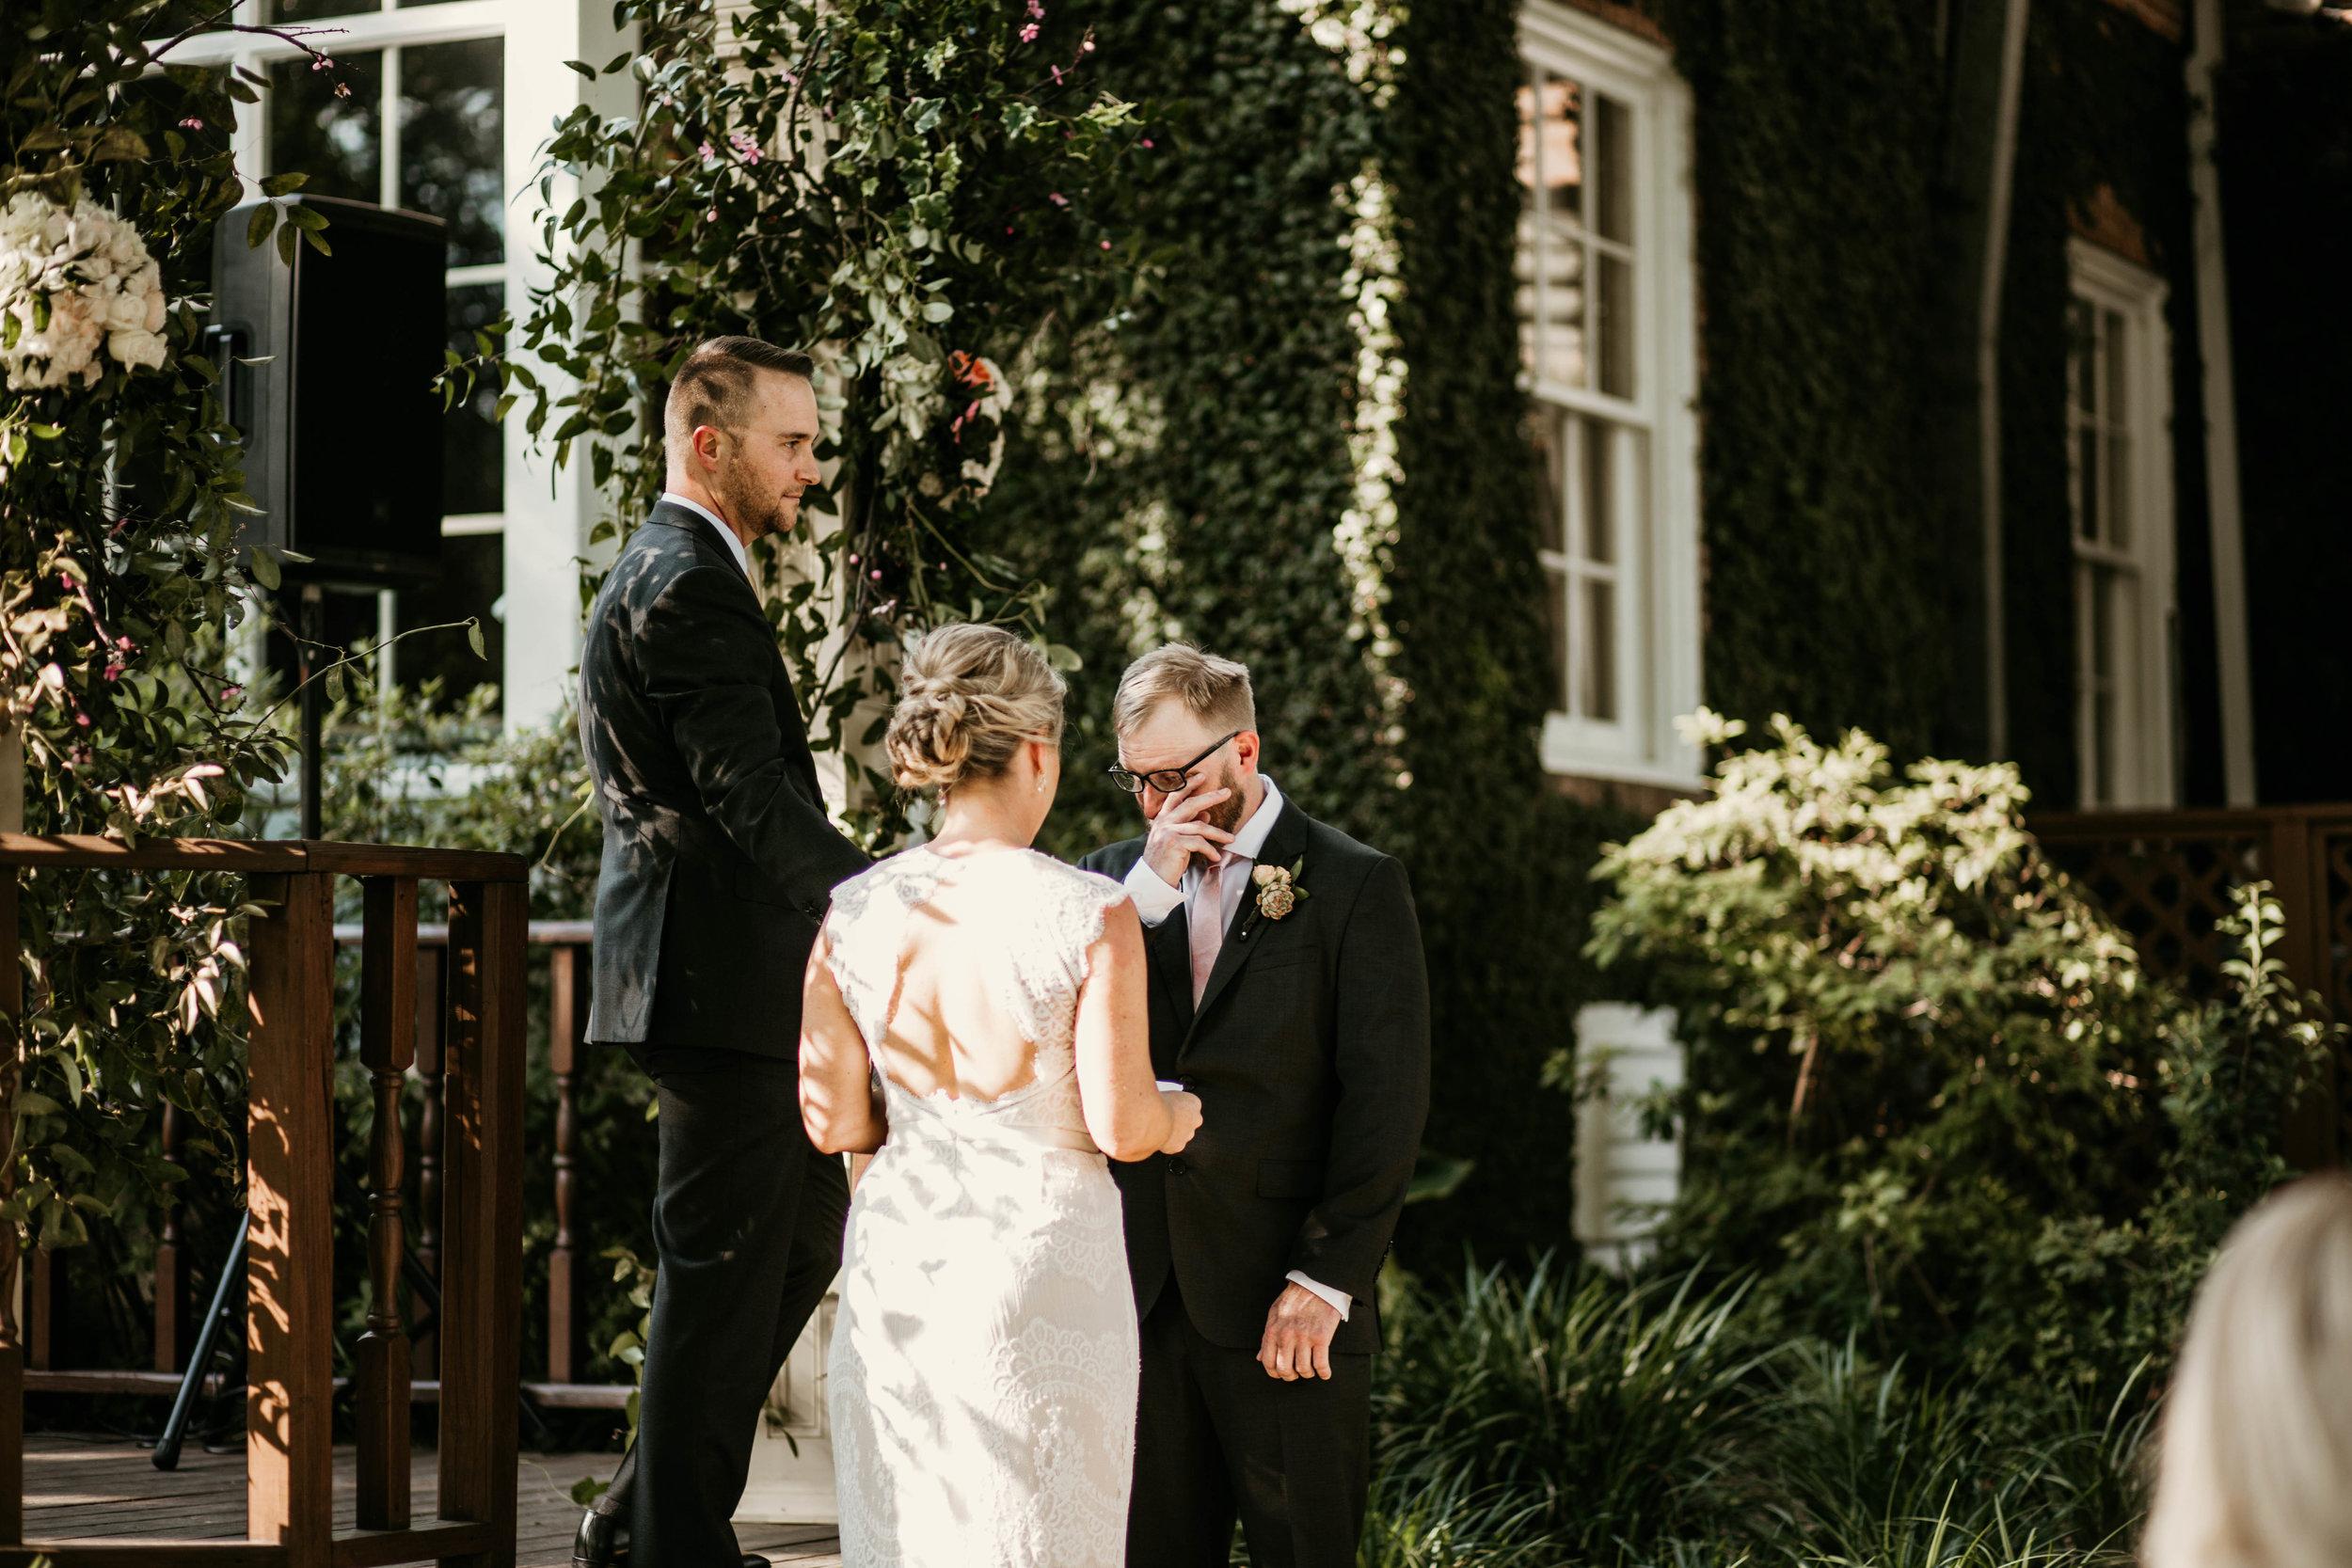 angie-carlton-the-manor-house-houston-wedding-25.jpg